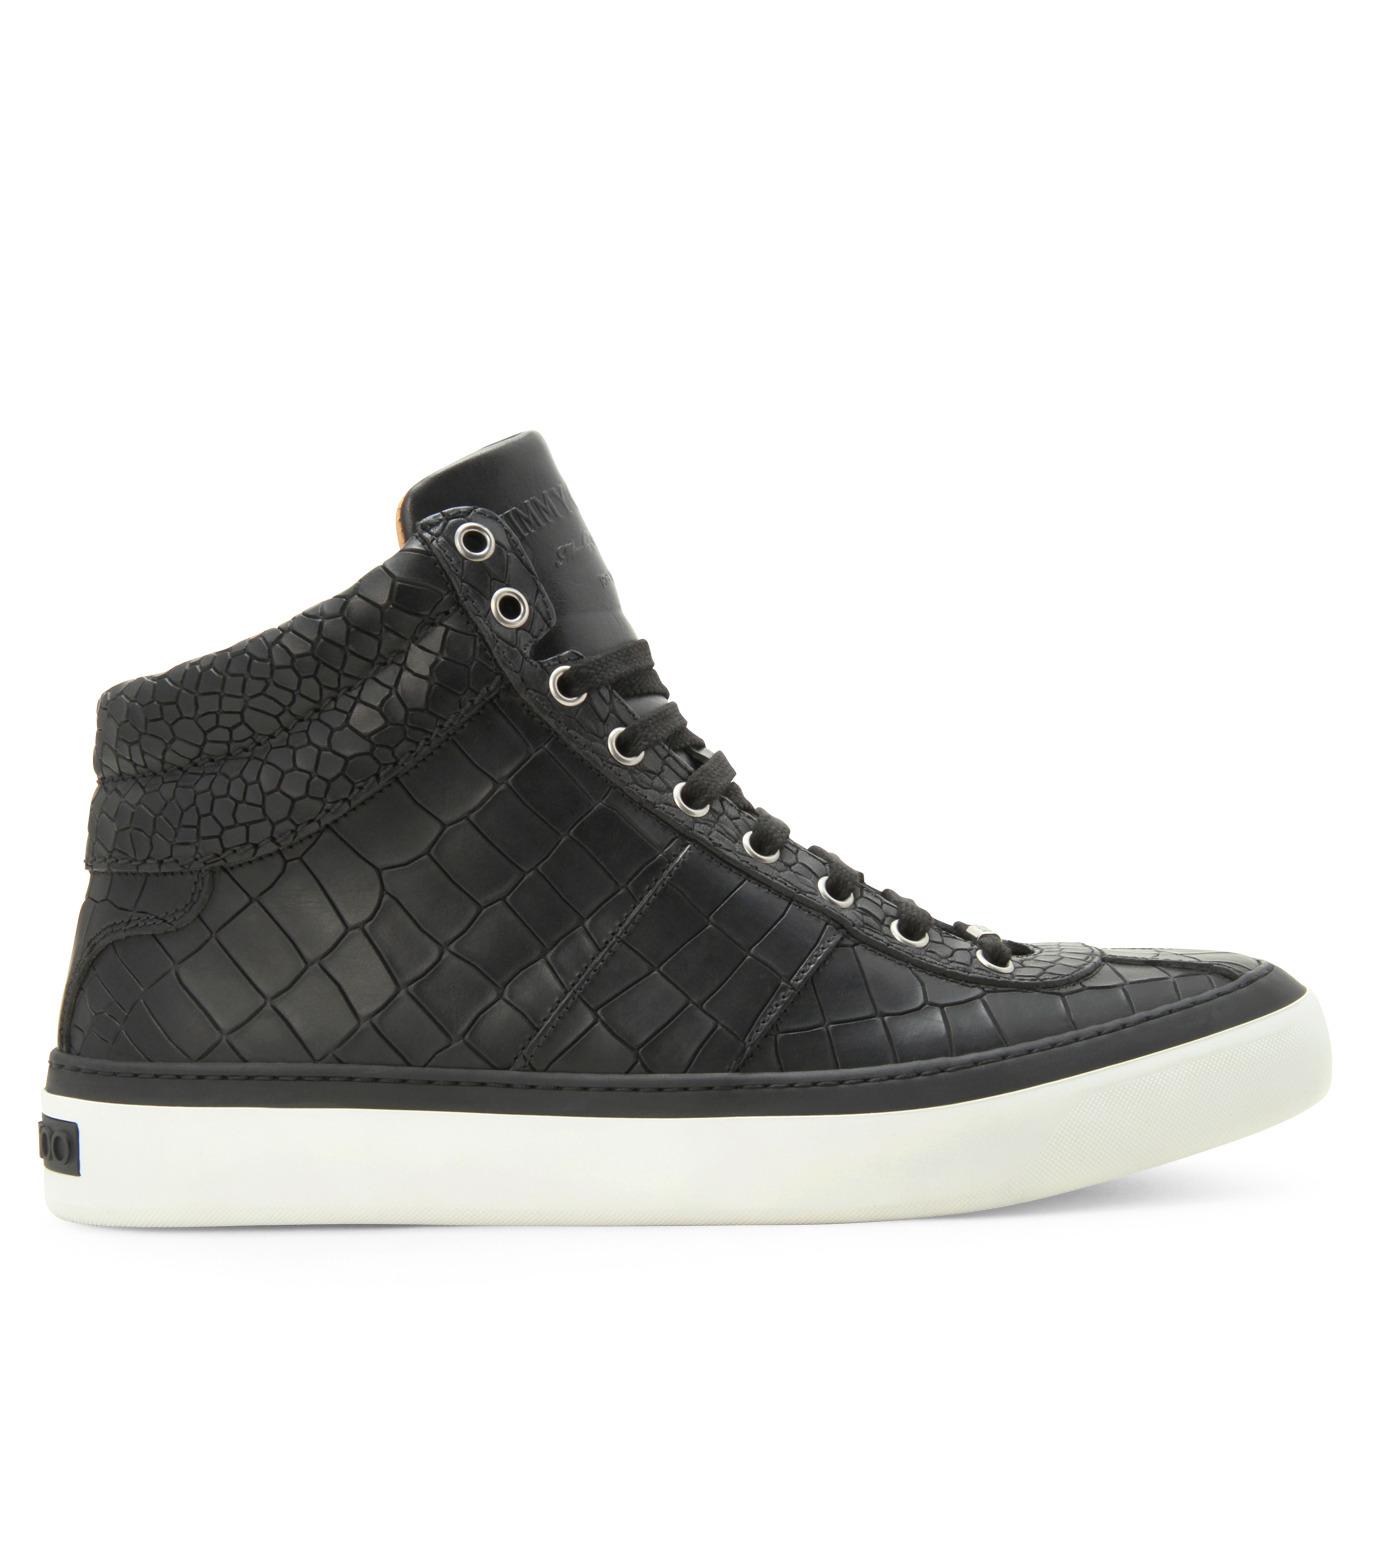 Jimmy Choo(ジミーチュウ)のCroco emboss sneaker-BLACK-BELGRAVI-CCL-13 拡大詳細画像1